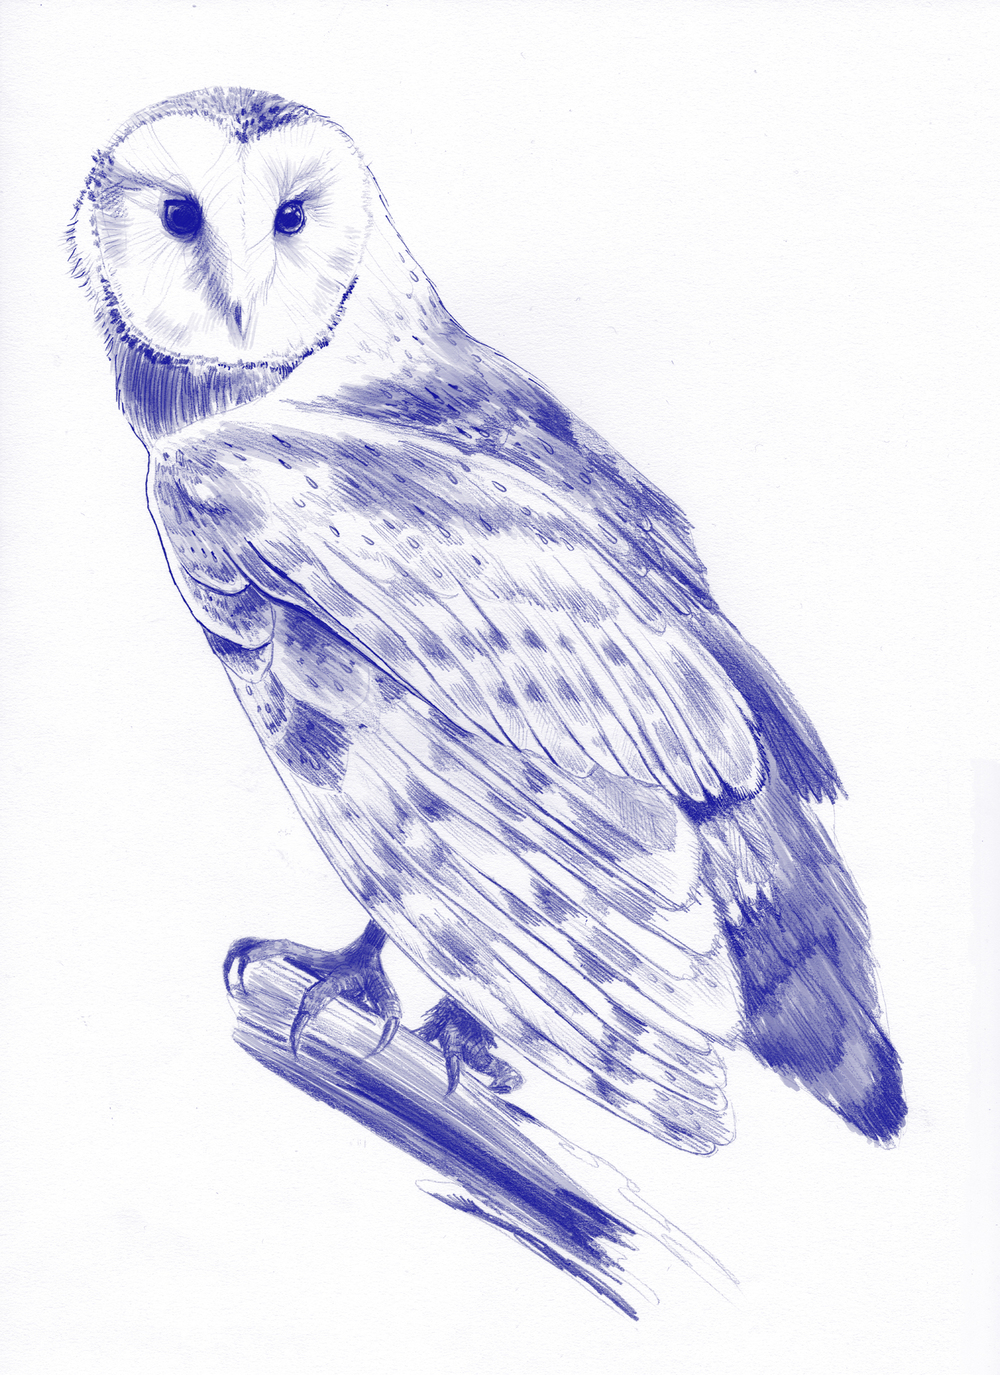 fig 3. Barn owl illustration